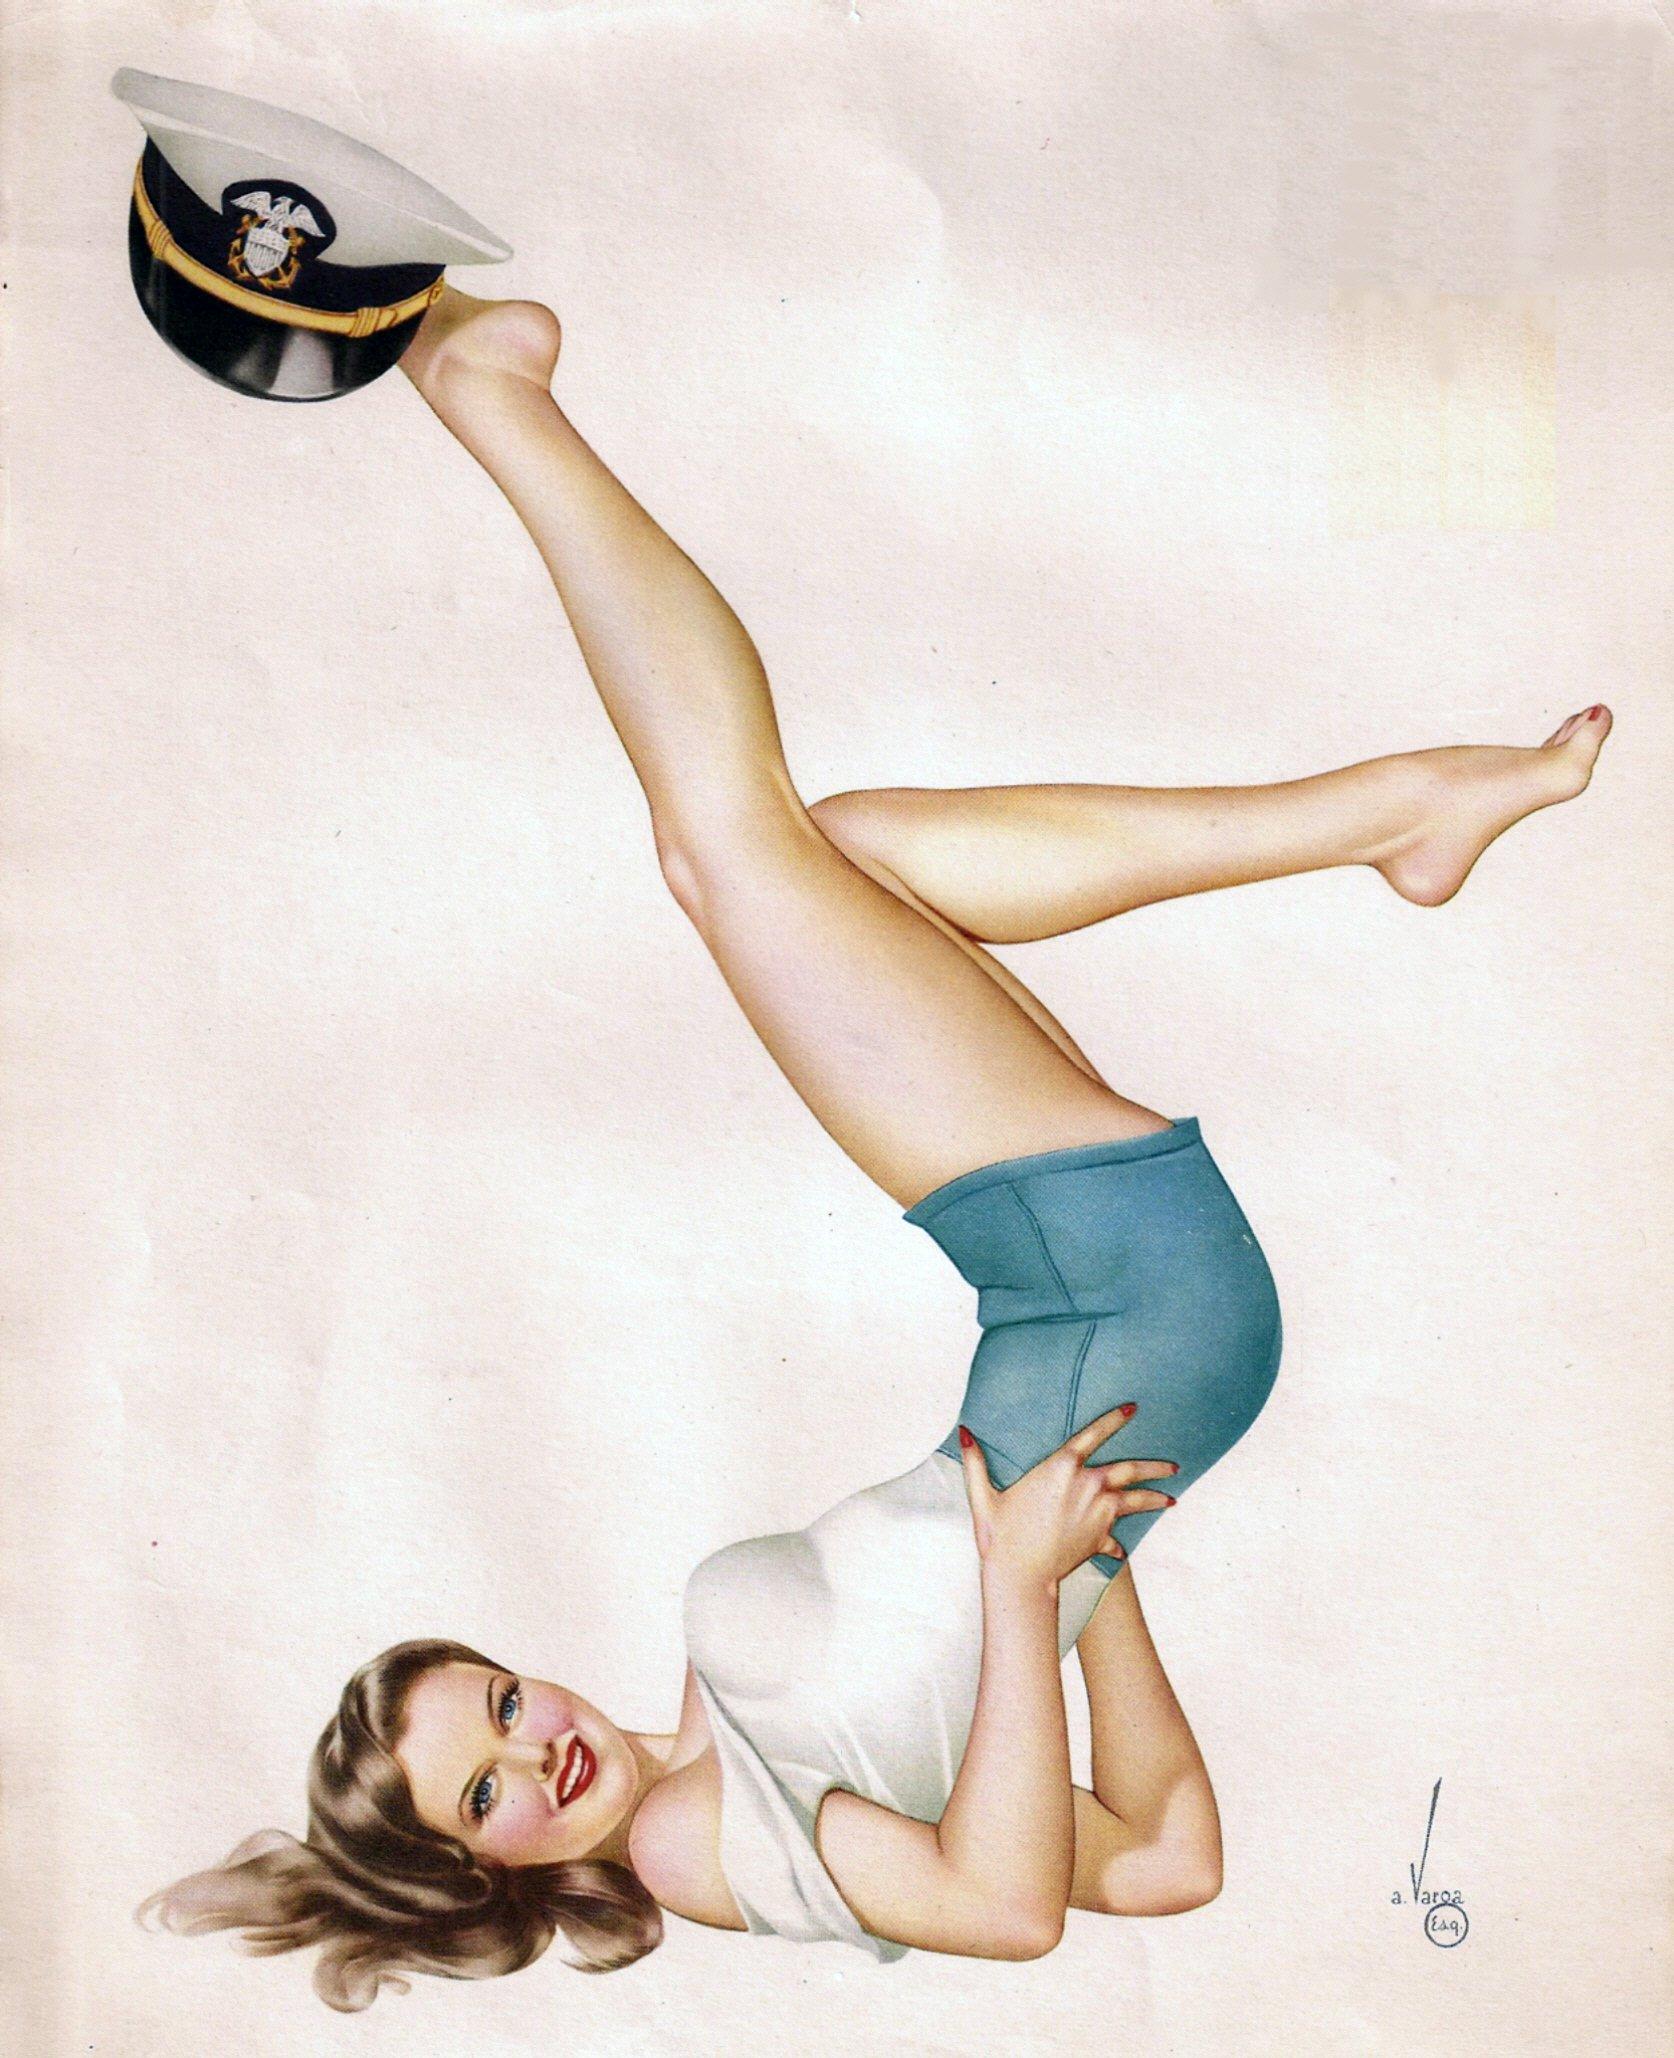 George Petty Pin Up Girls: Vargas Pin Up Wallpaper